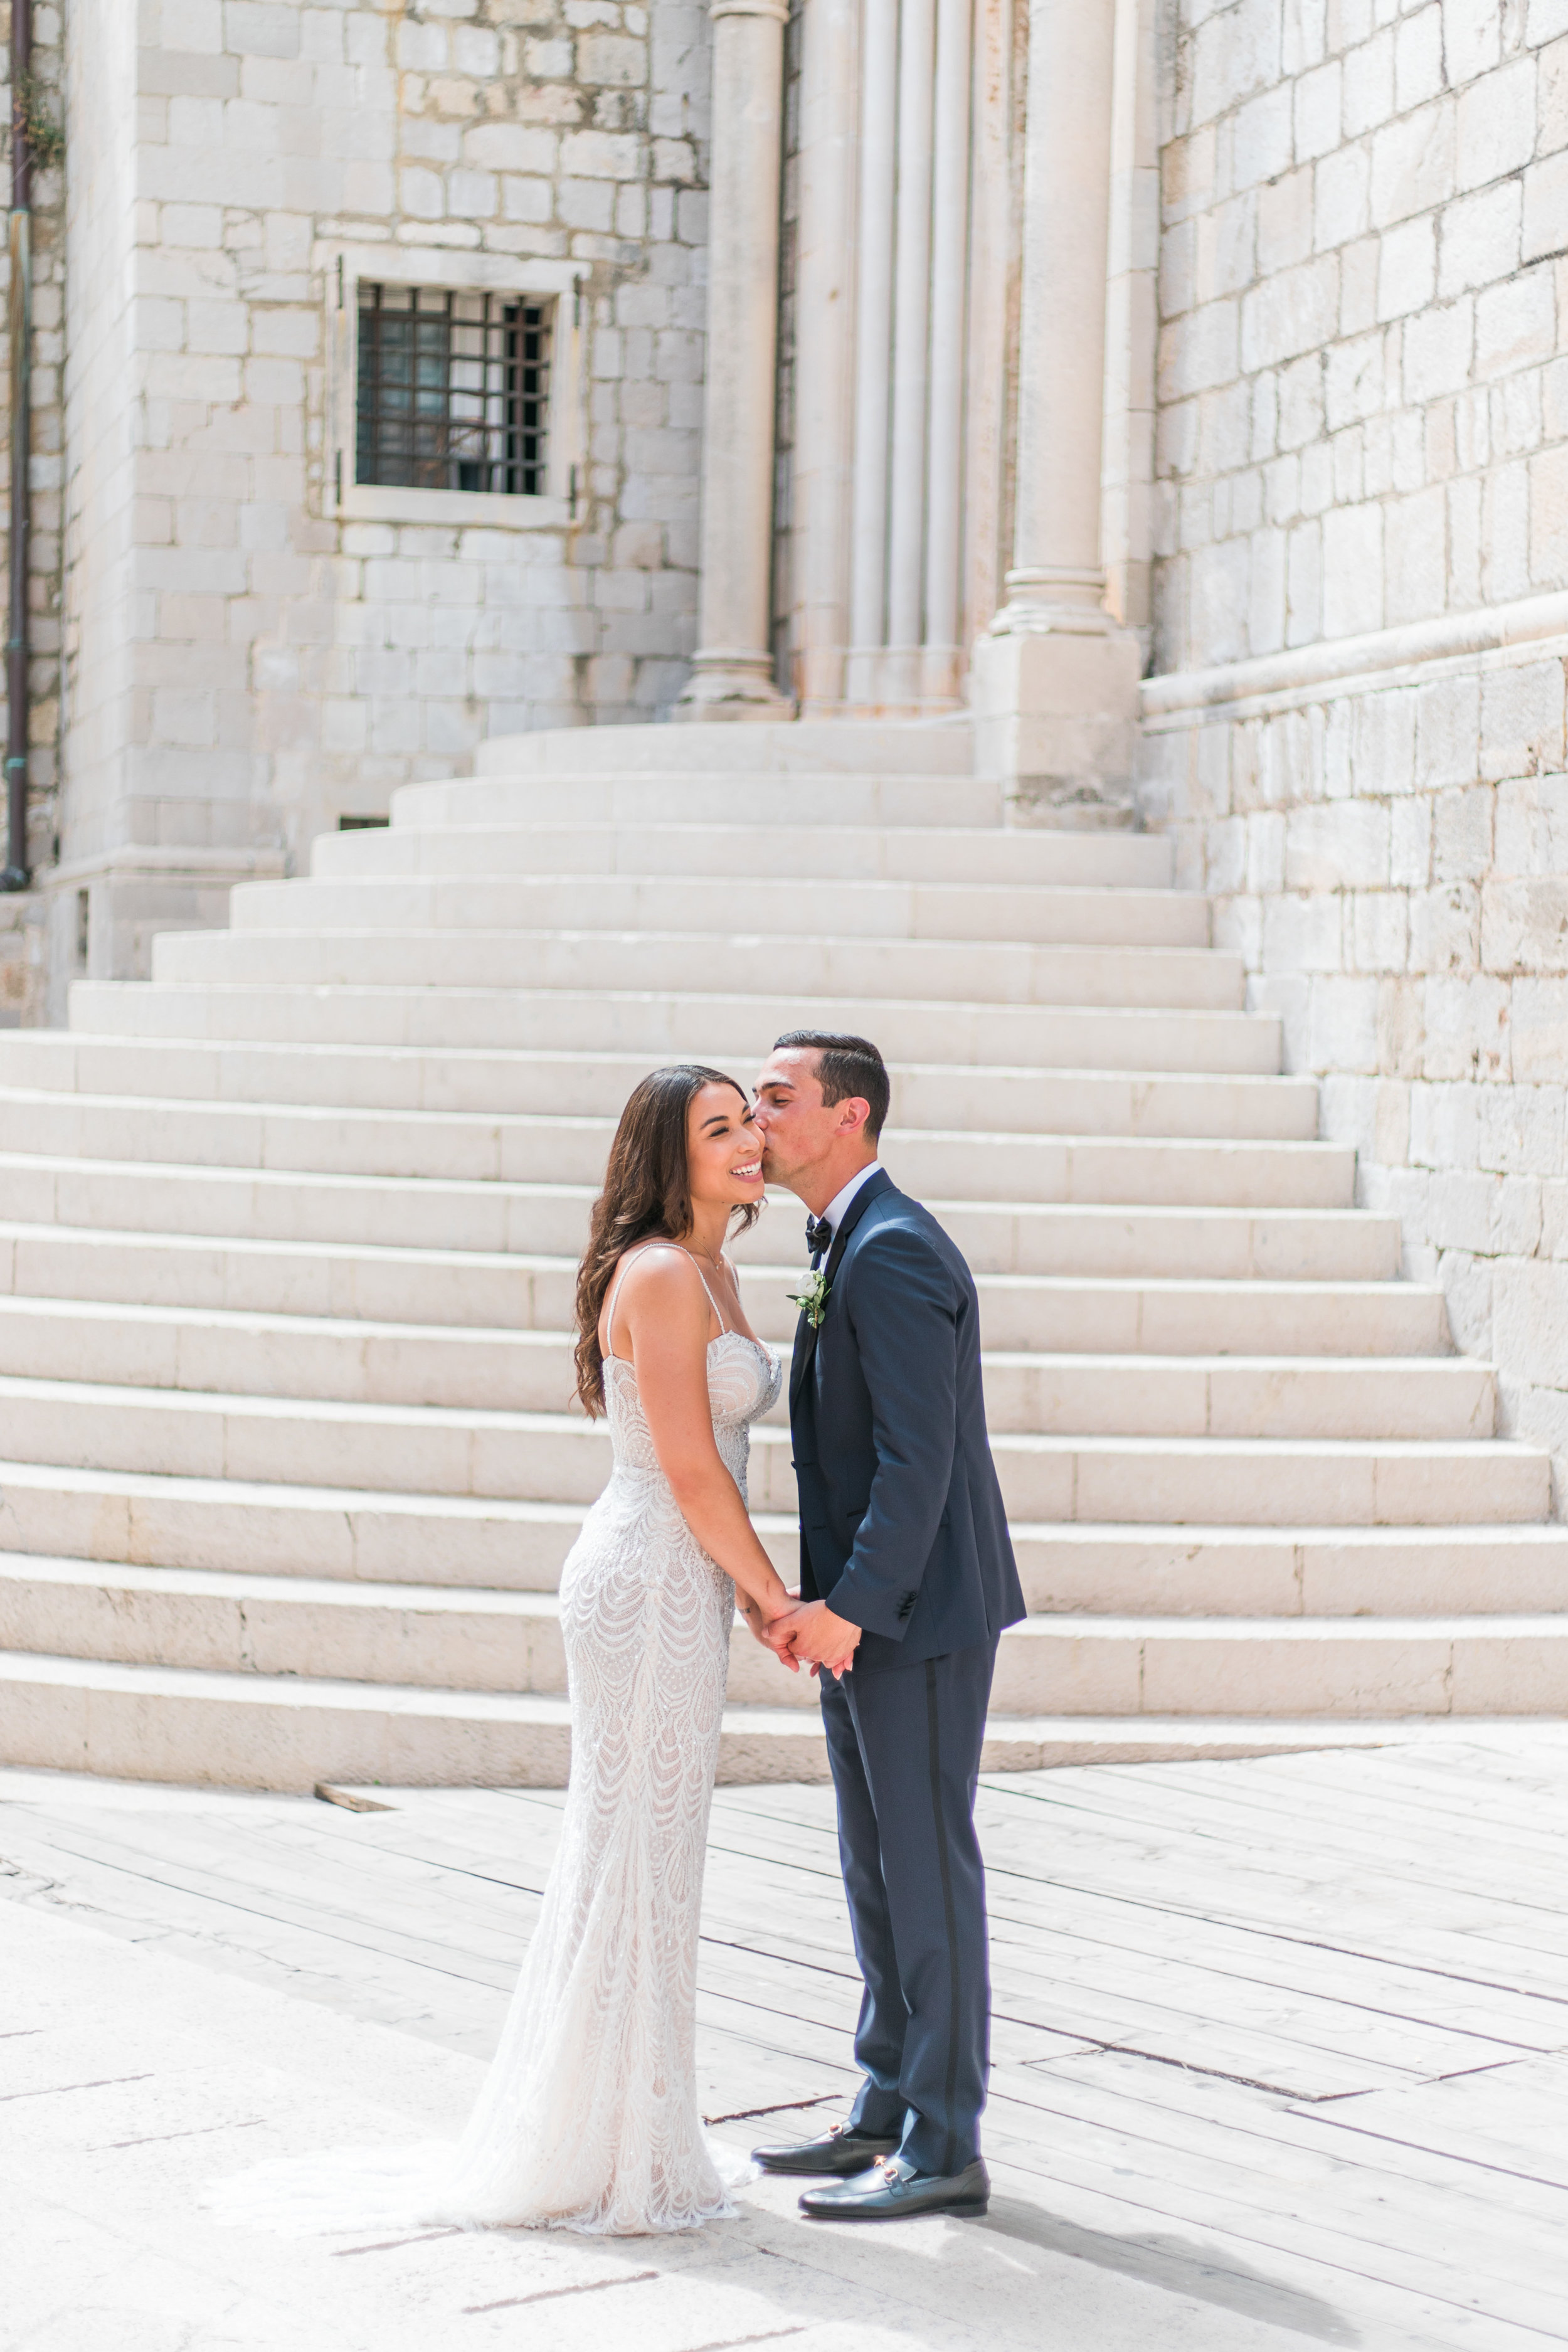 Dubrovnik-Wedding-Photographer-Croatia-Wedding-Photos-JBJ-Pictures-3.jpg